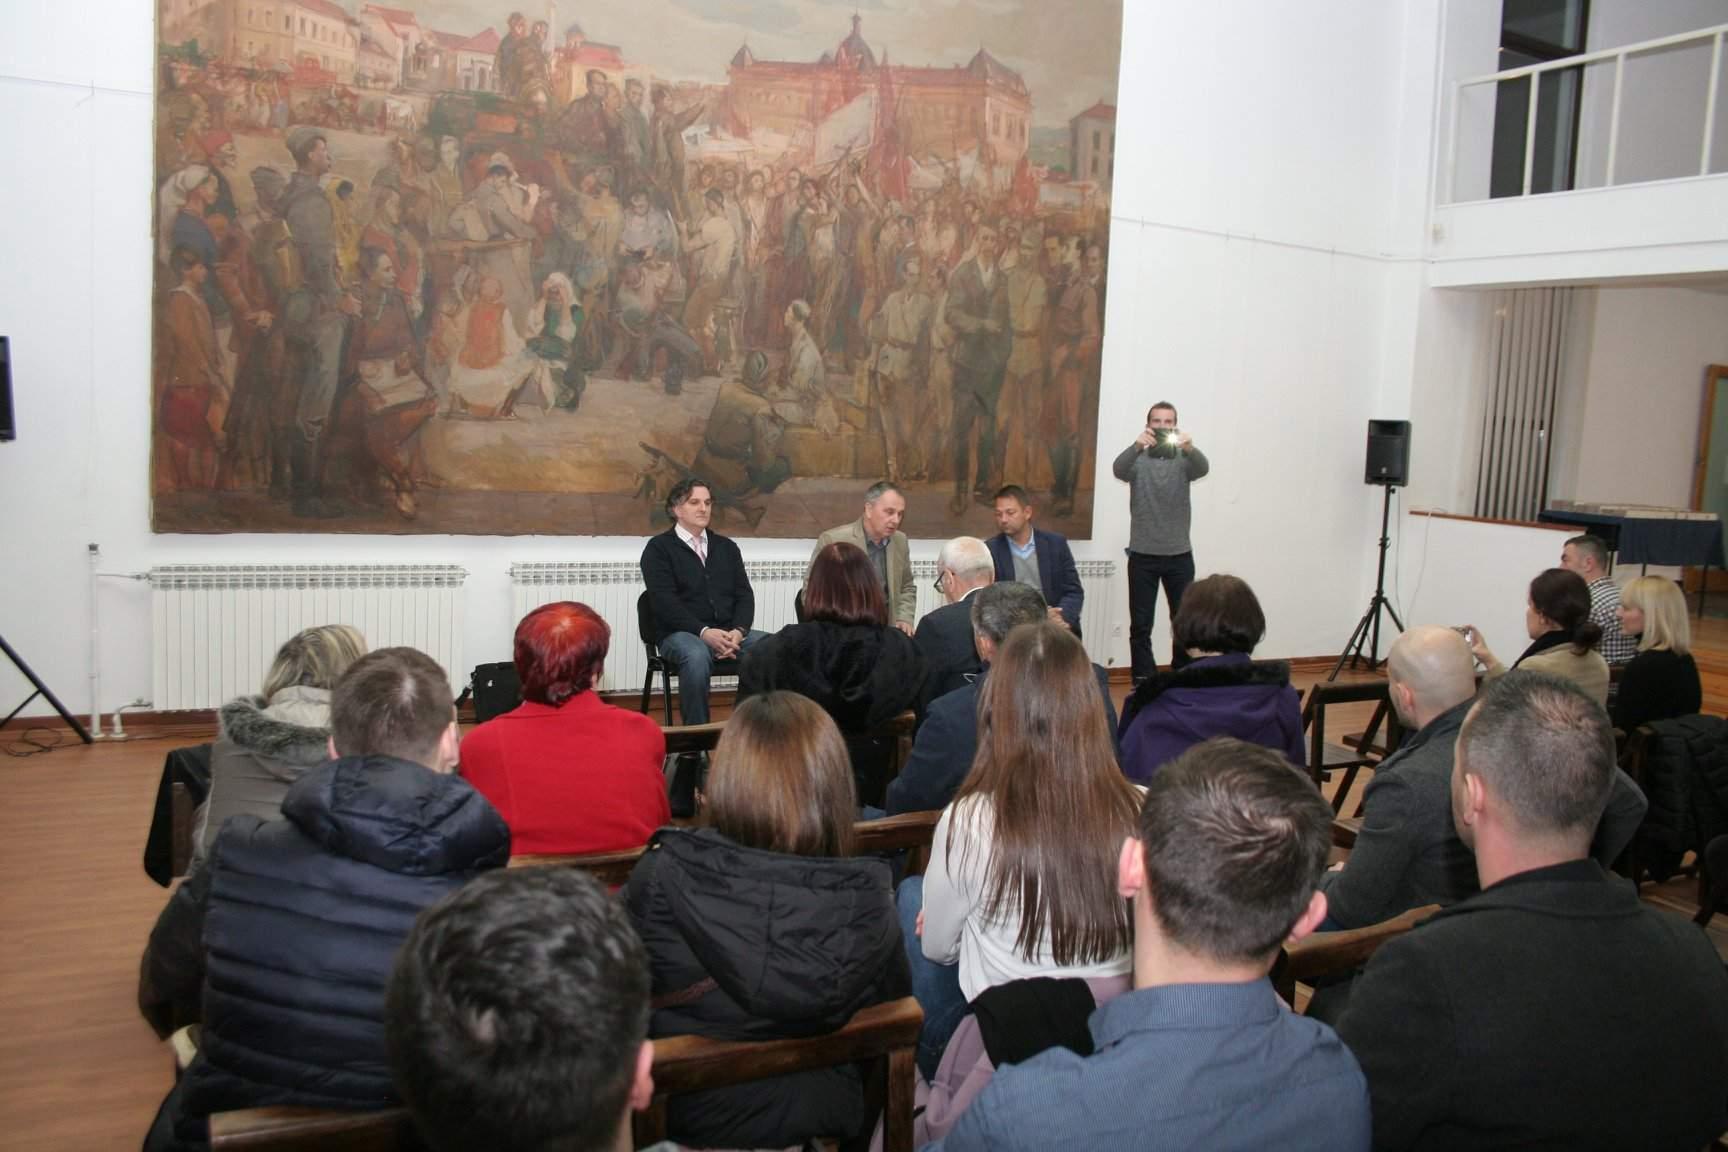 (Foto: INS) - Bosanstvo i Bosna su sinonimi za ljubav